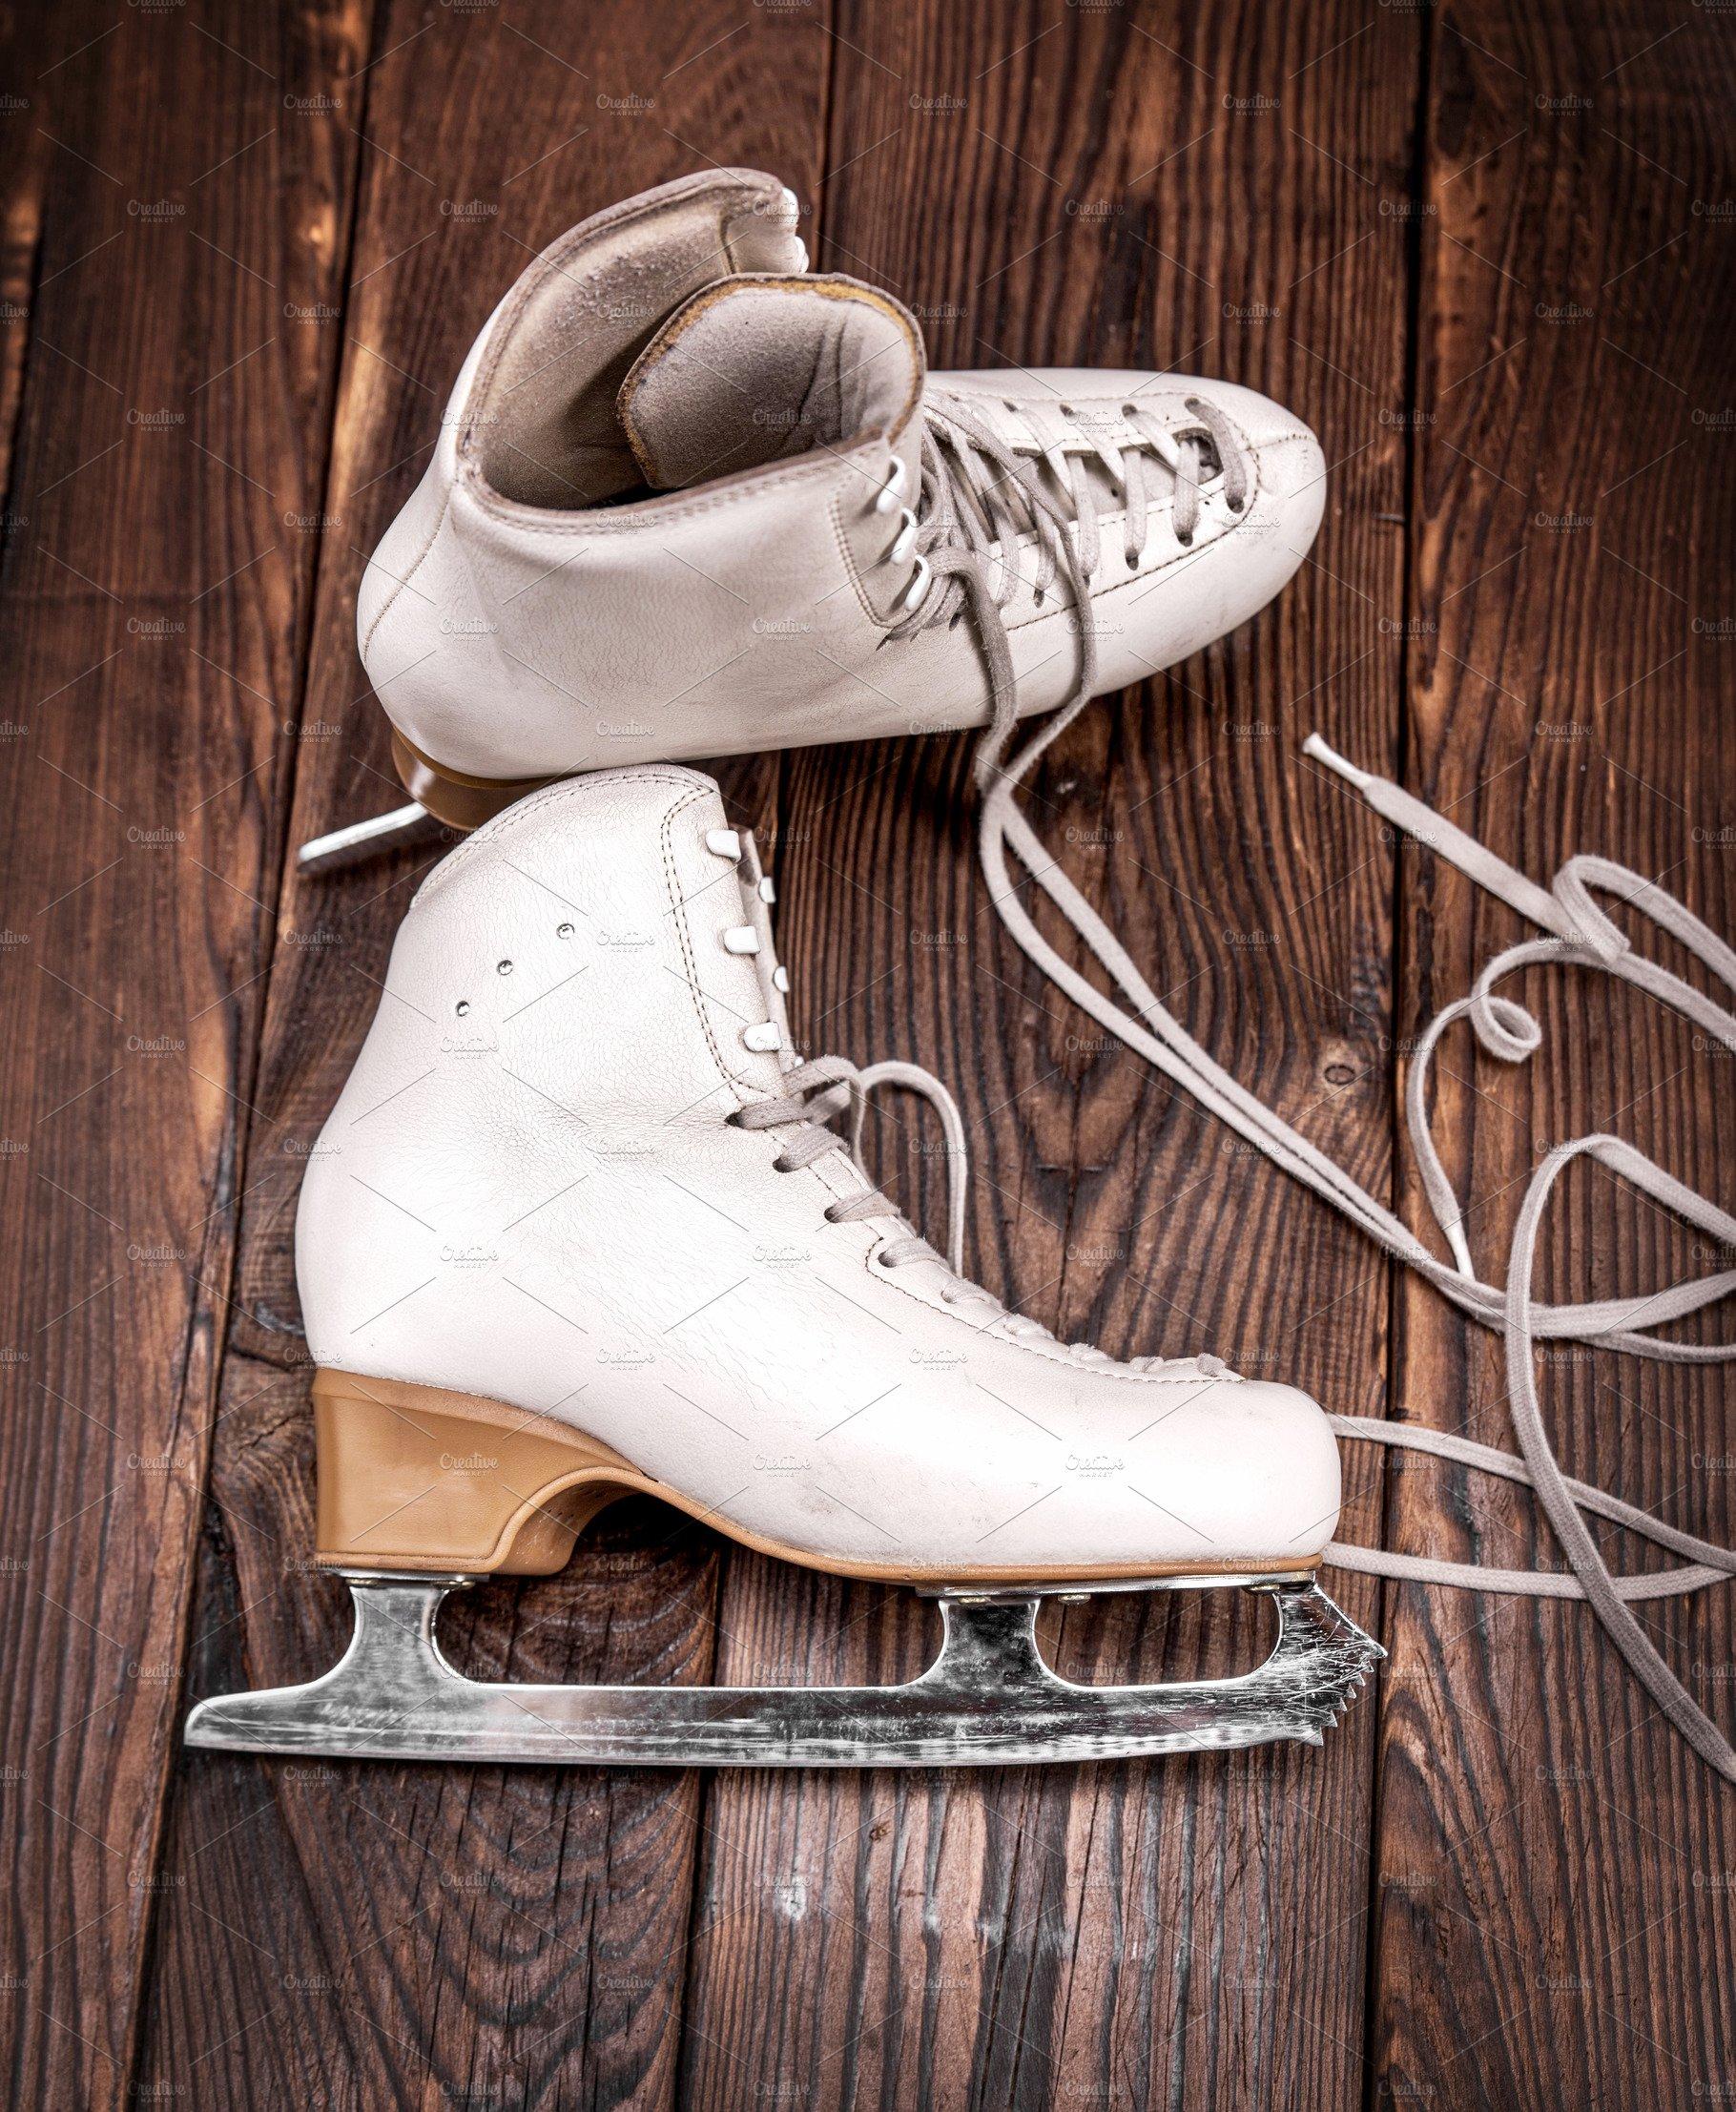 60158a547295b pair of white leather female skates